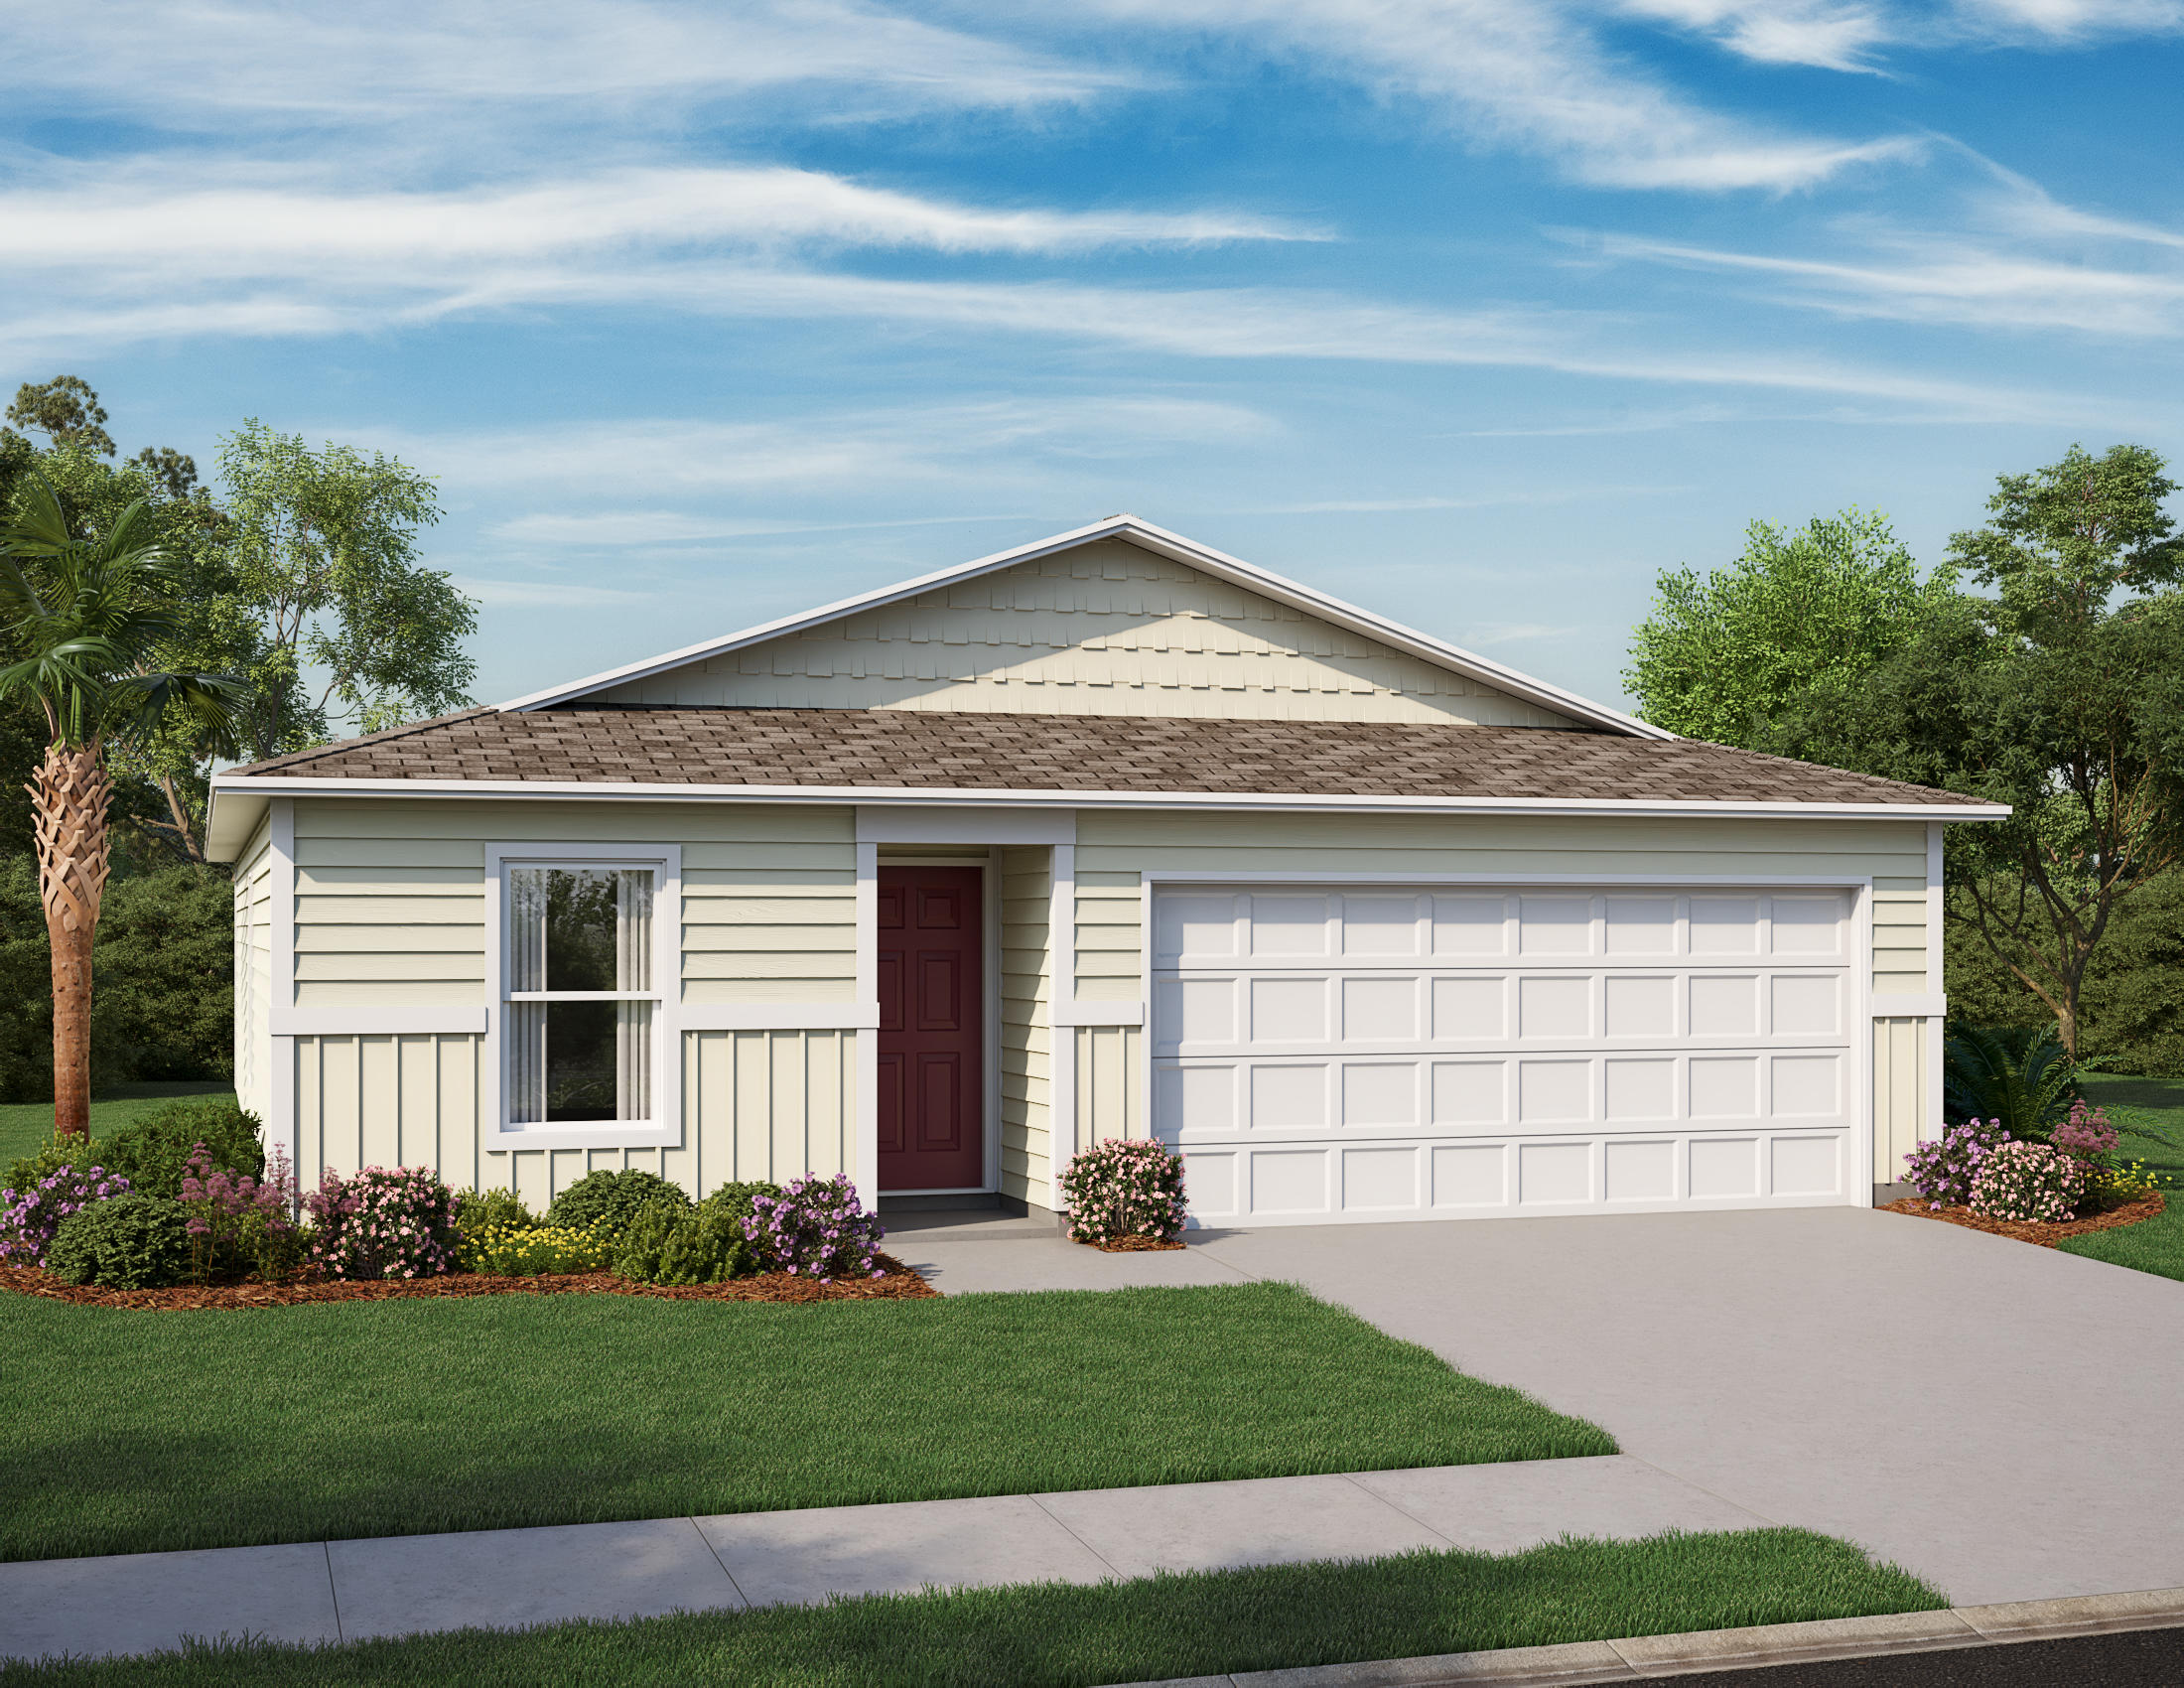 2192 Floresta Drive, Port Saint Lucie, Florida 34983, 3 Bedrooms Bedrooms, ,2 BathroomsBathrooms,A,Single family,Floresta,RX-10420396